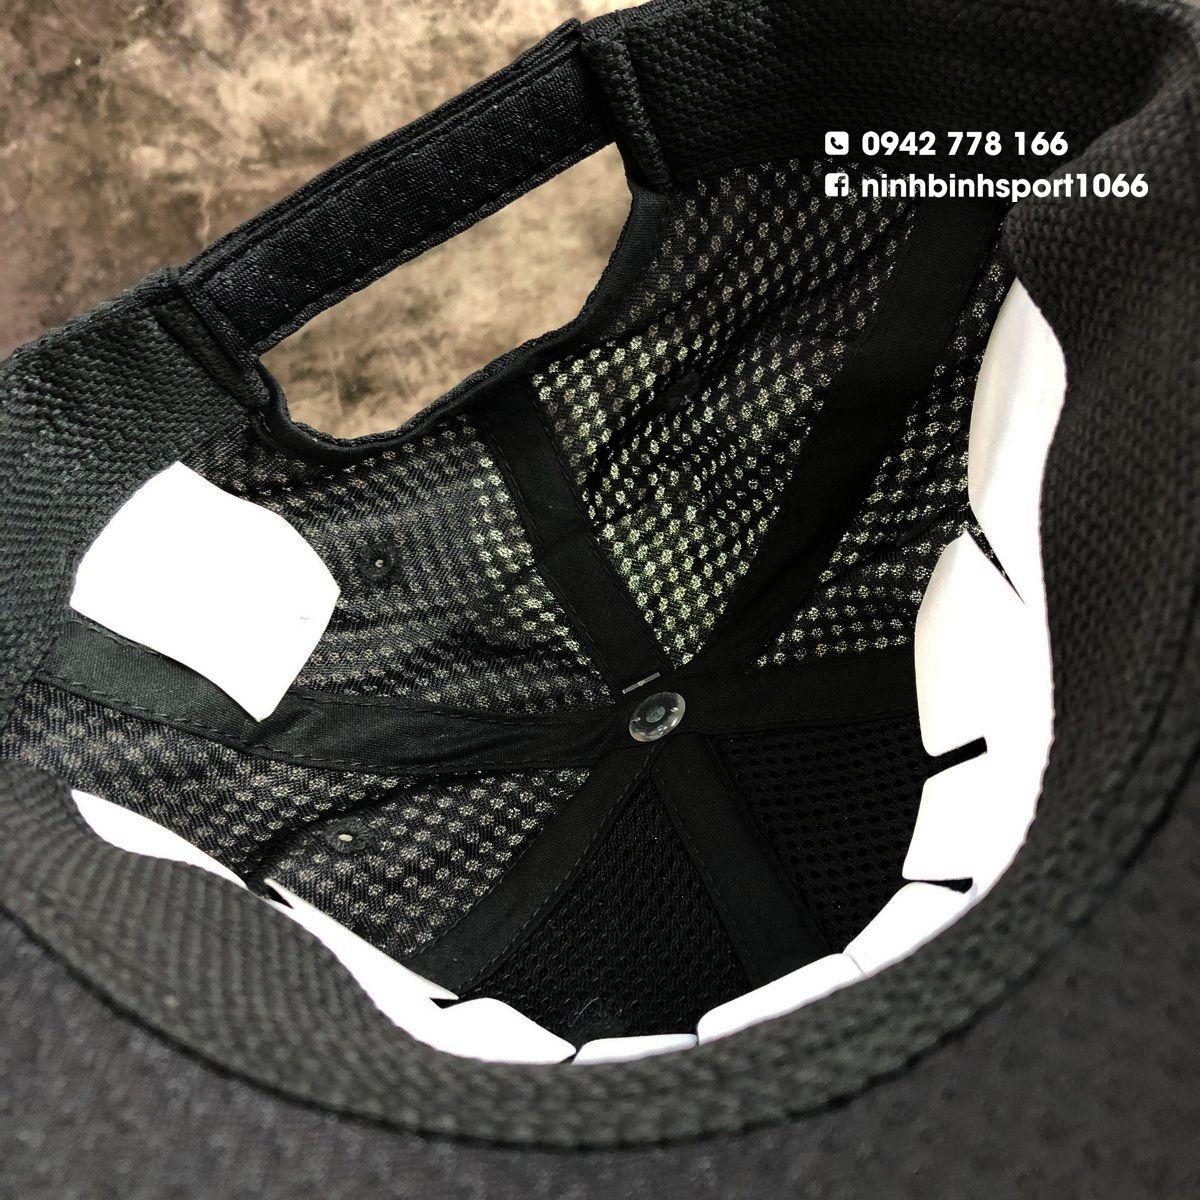 Mũ thể thao Adidas 517-01-OSFX